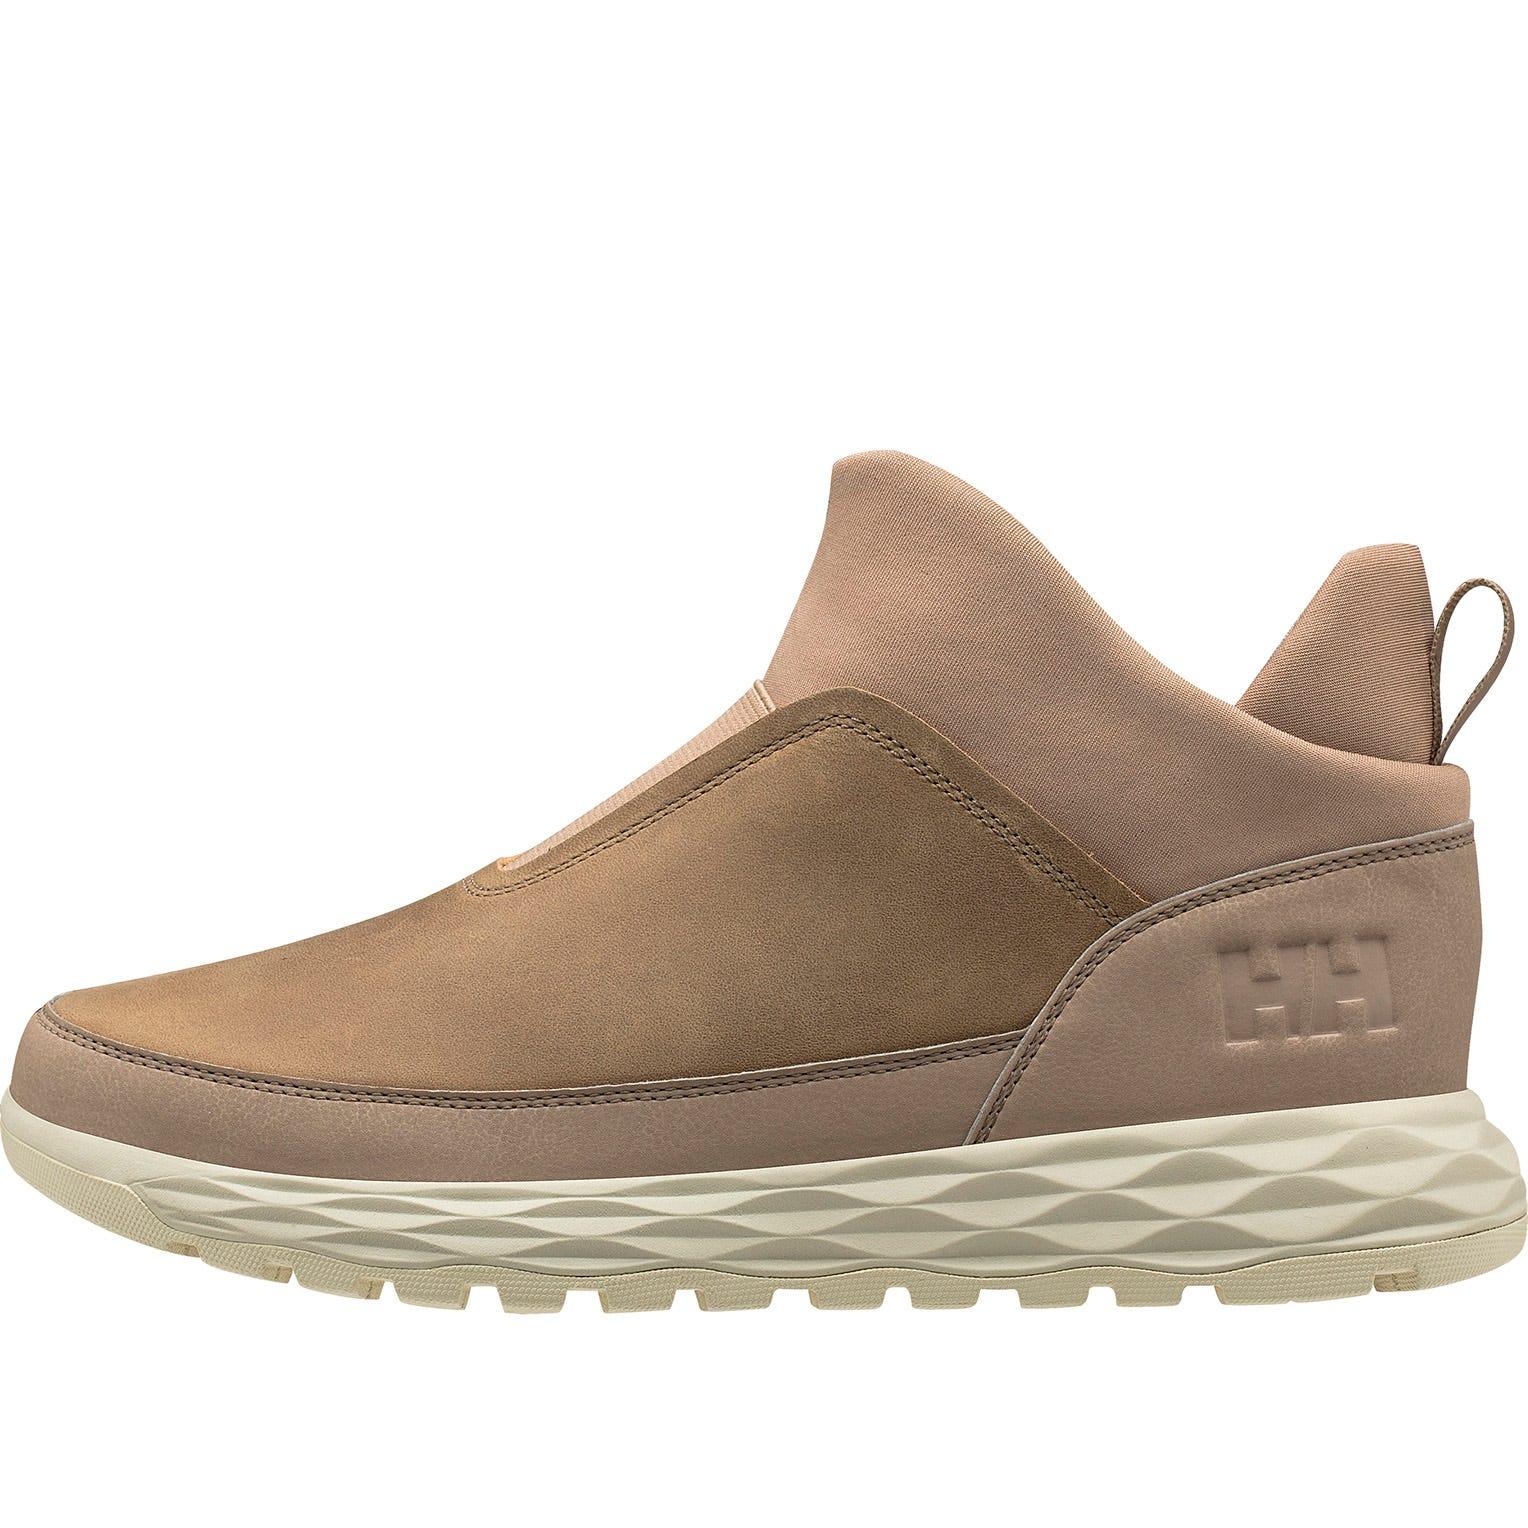 Helly Hansen W Cora Womens Casual Shoe Yellow 42/10